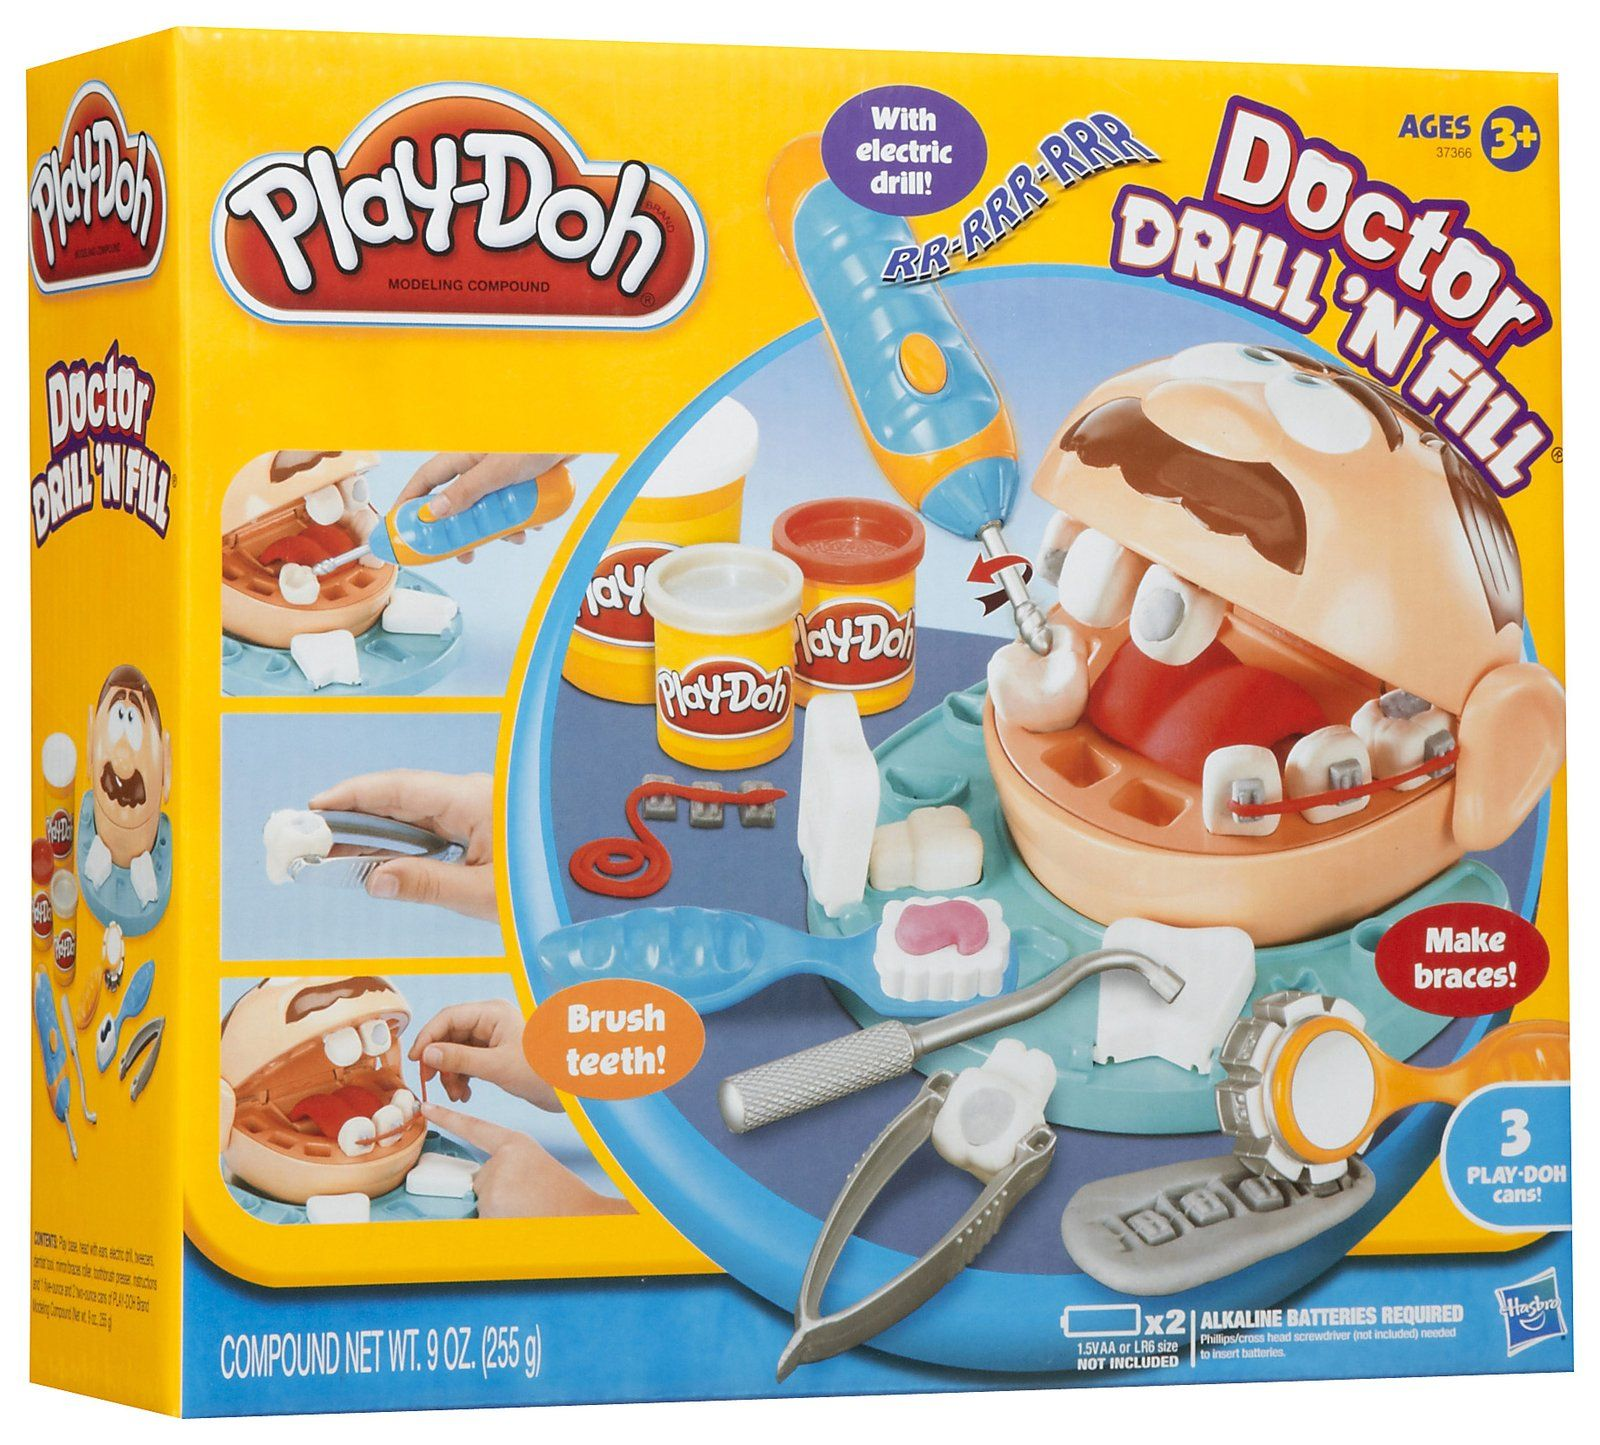 Best gift idea ever! granddental Play doh, Hasbro play